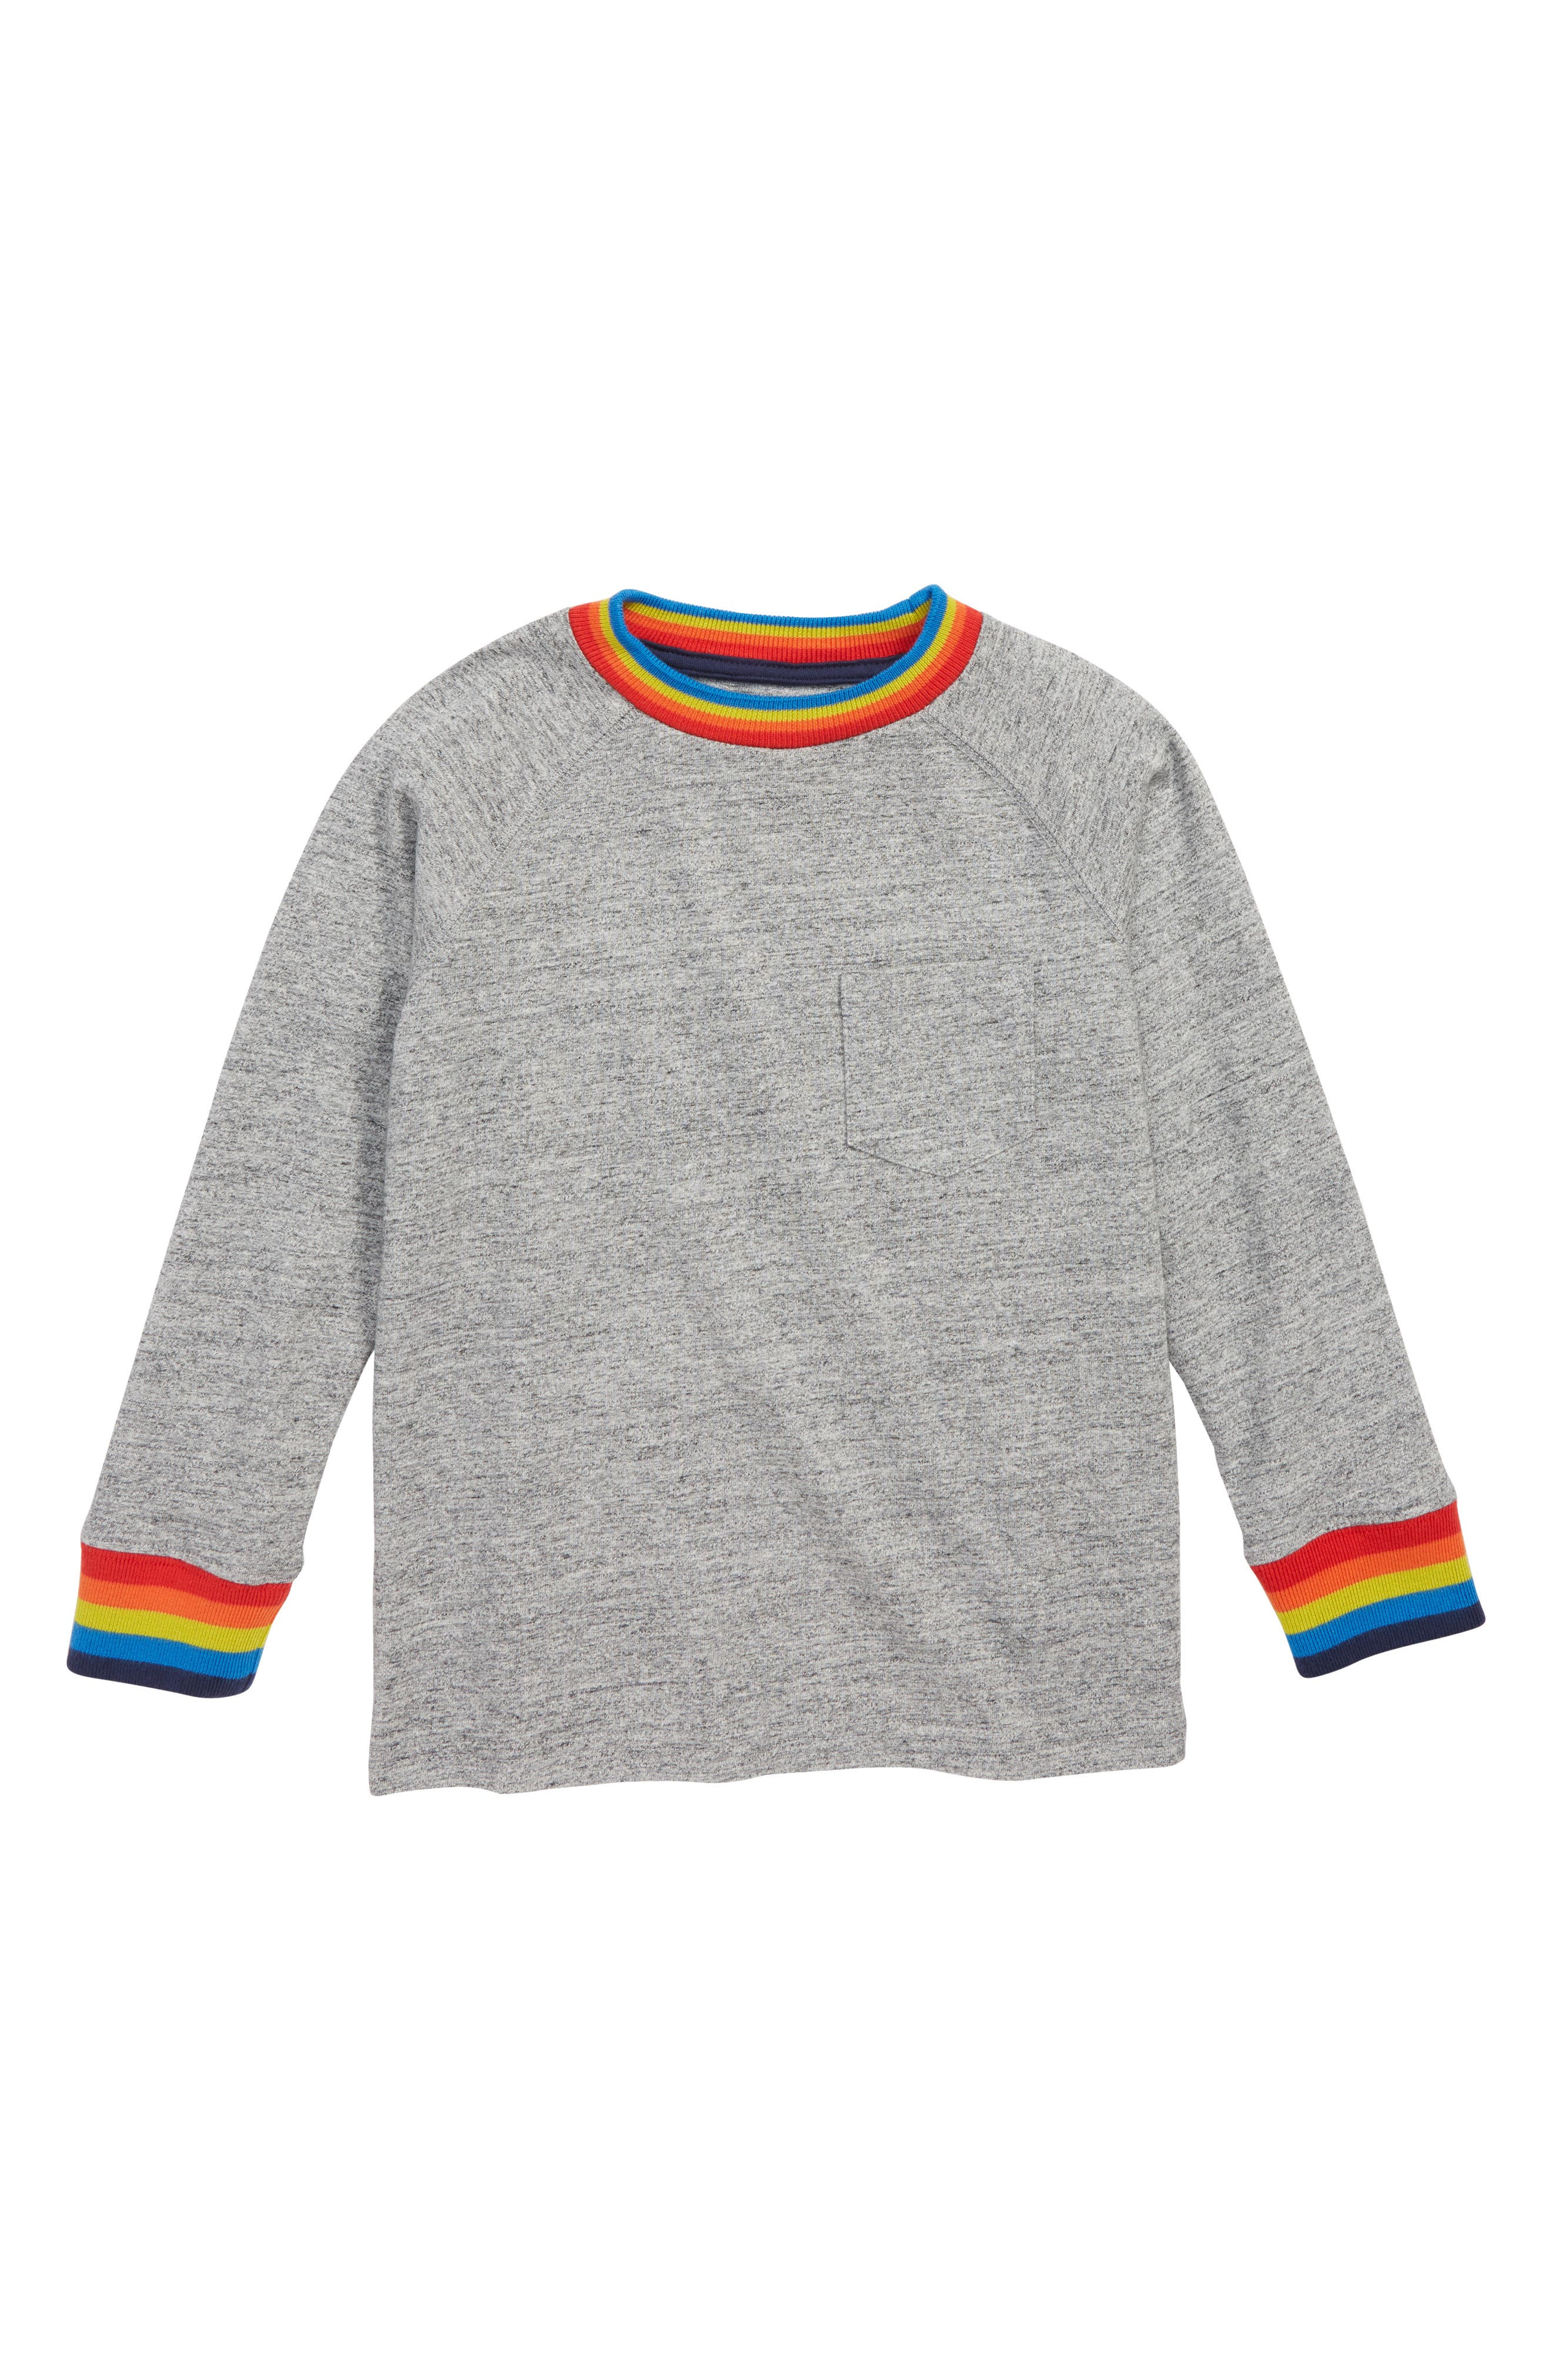 Stripe Raglan Sweatshirt,                         Main,                         color, GREY MARL JASPE